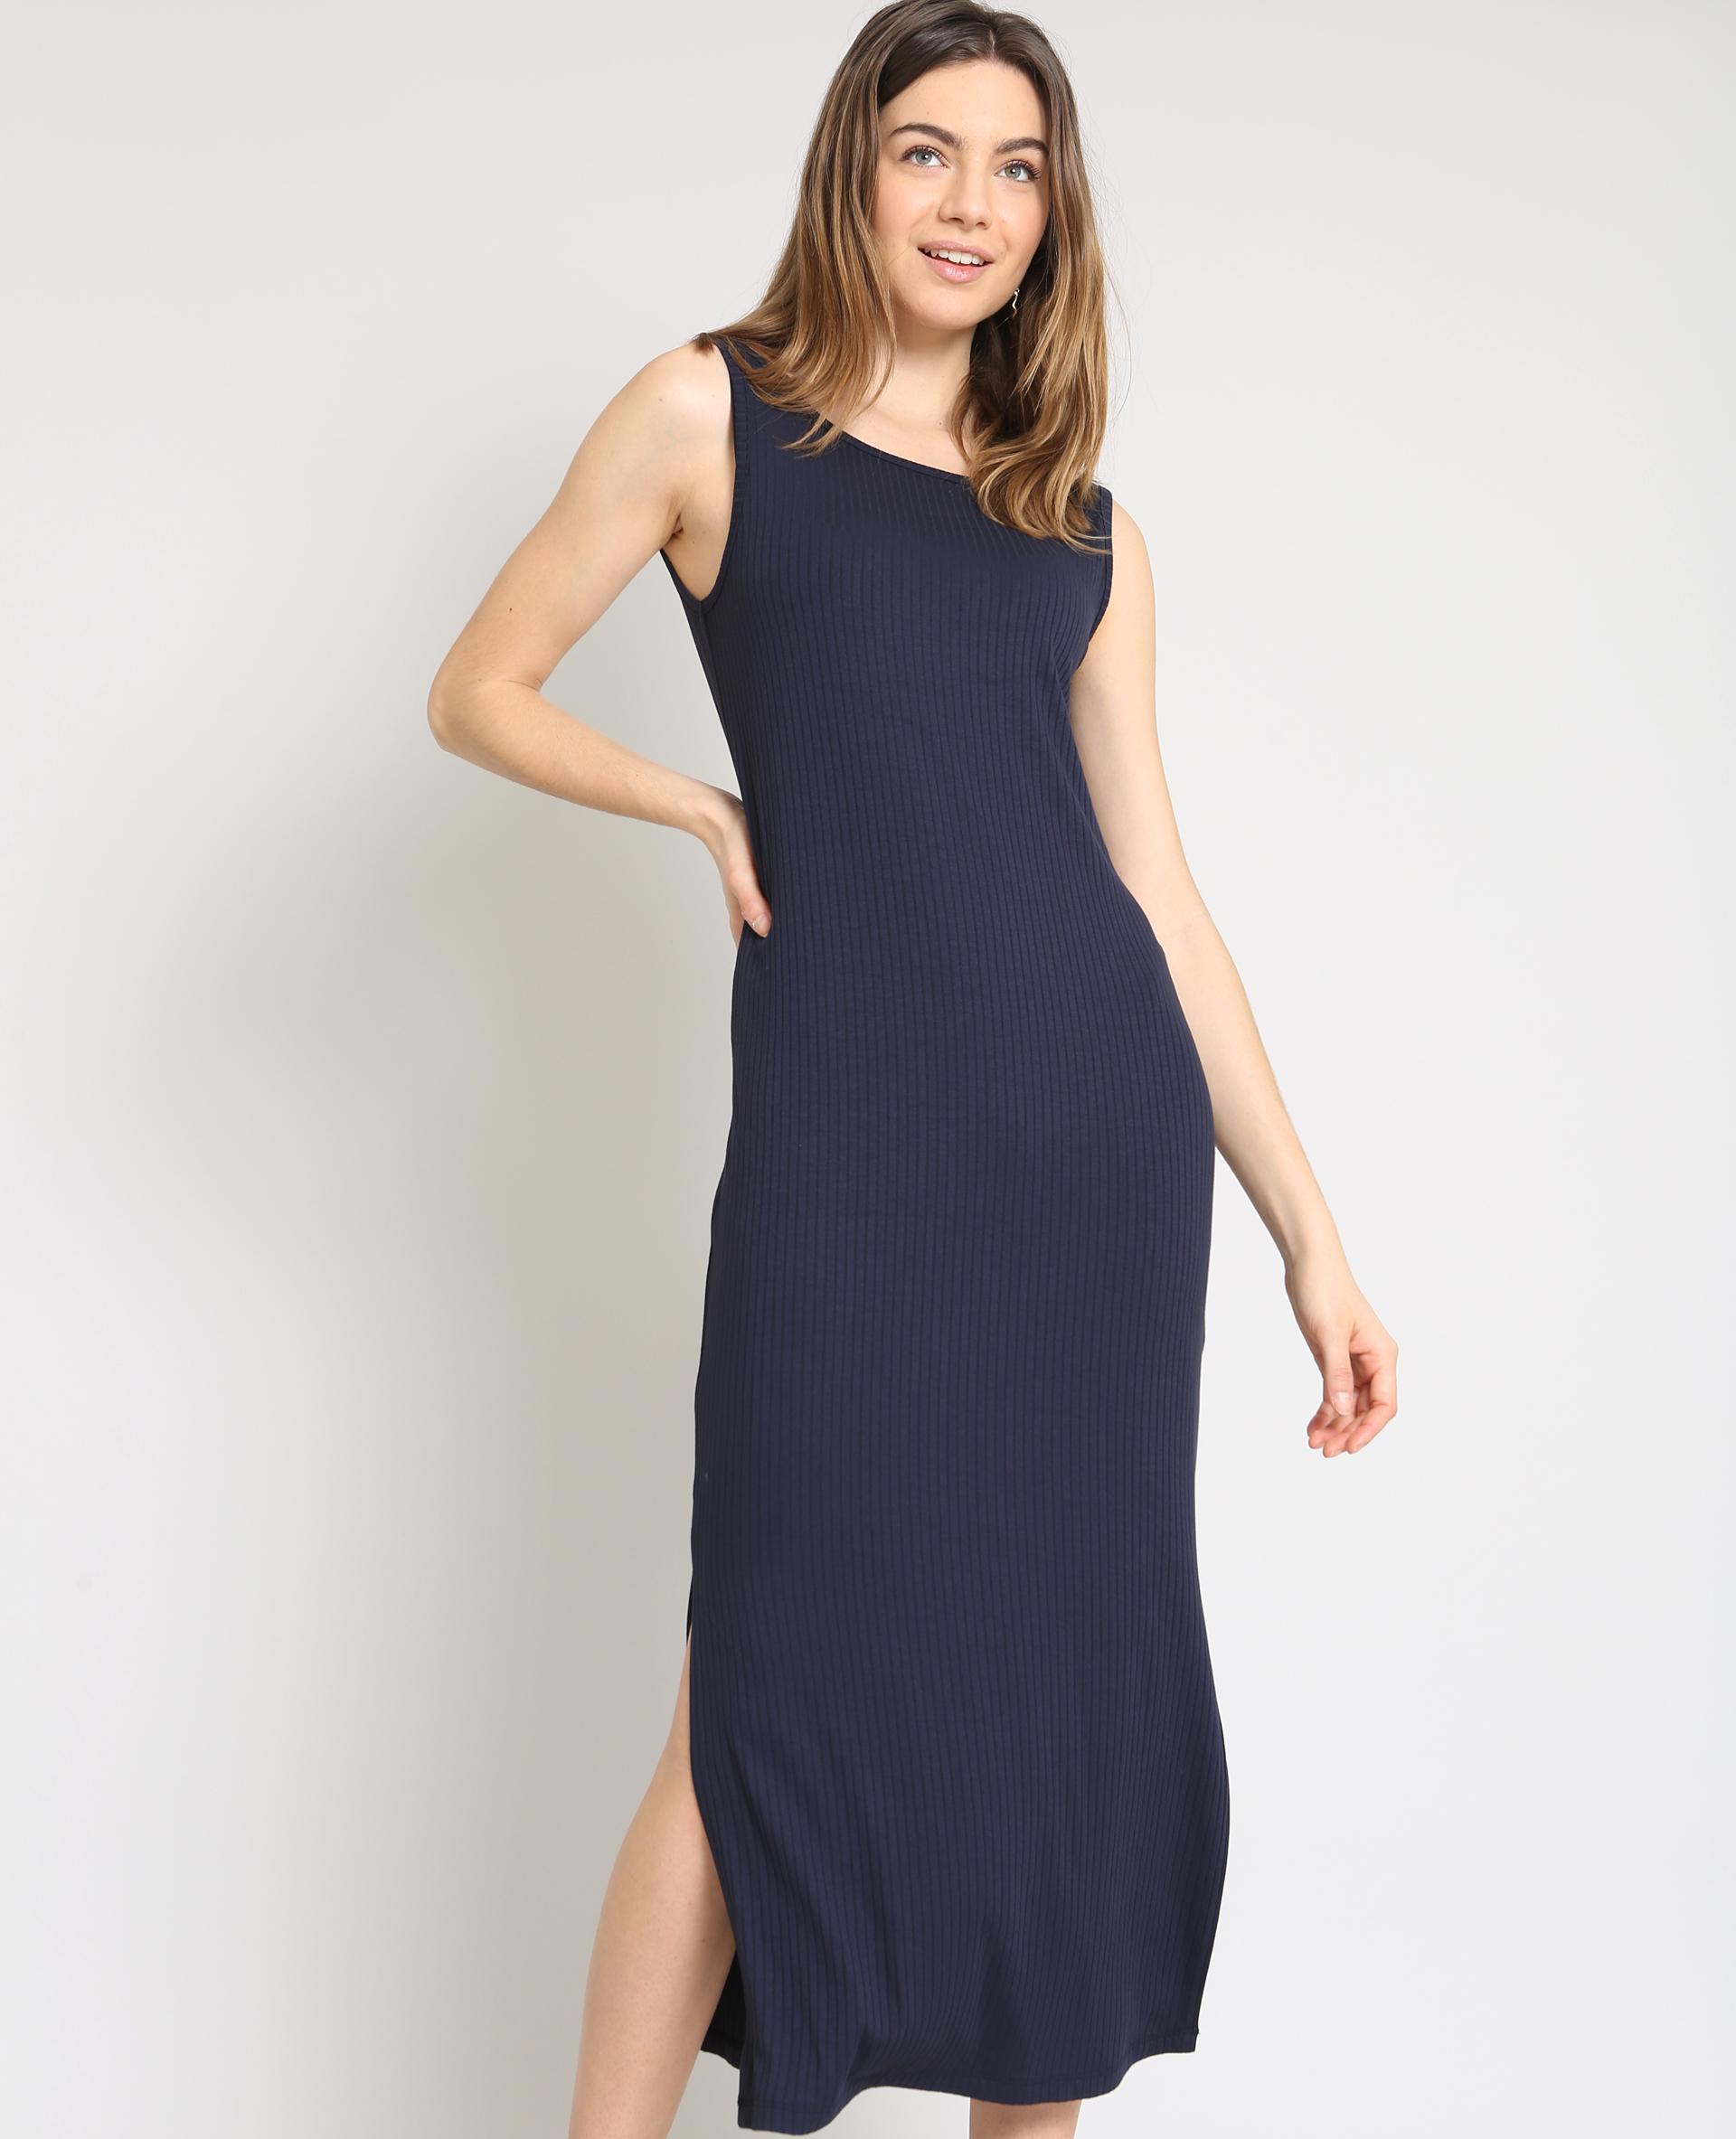 robe longue moulante bleu marine 50 780885b03a06 pimkie. Black Bedroom Furniture Sets. Home Design Ideas